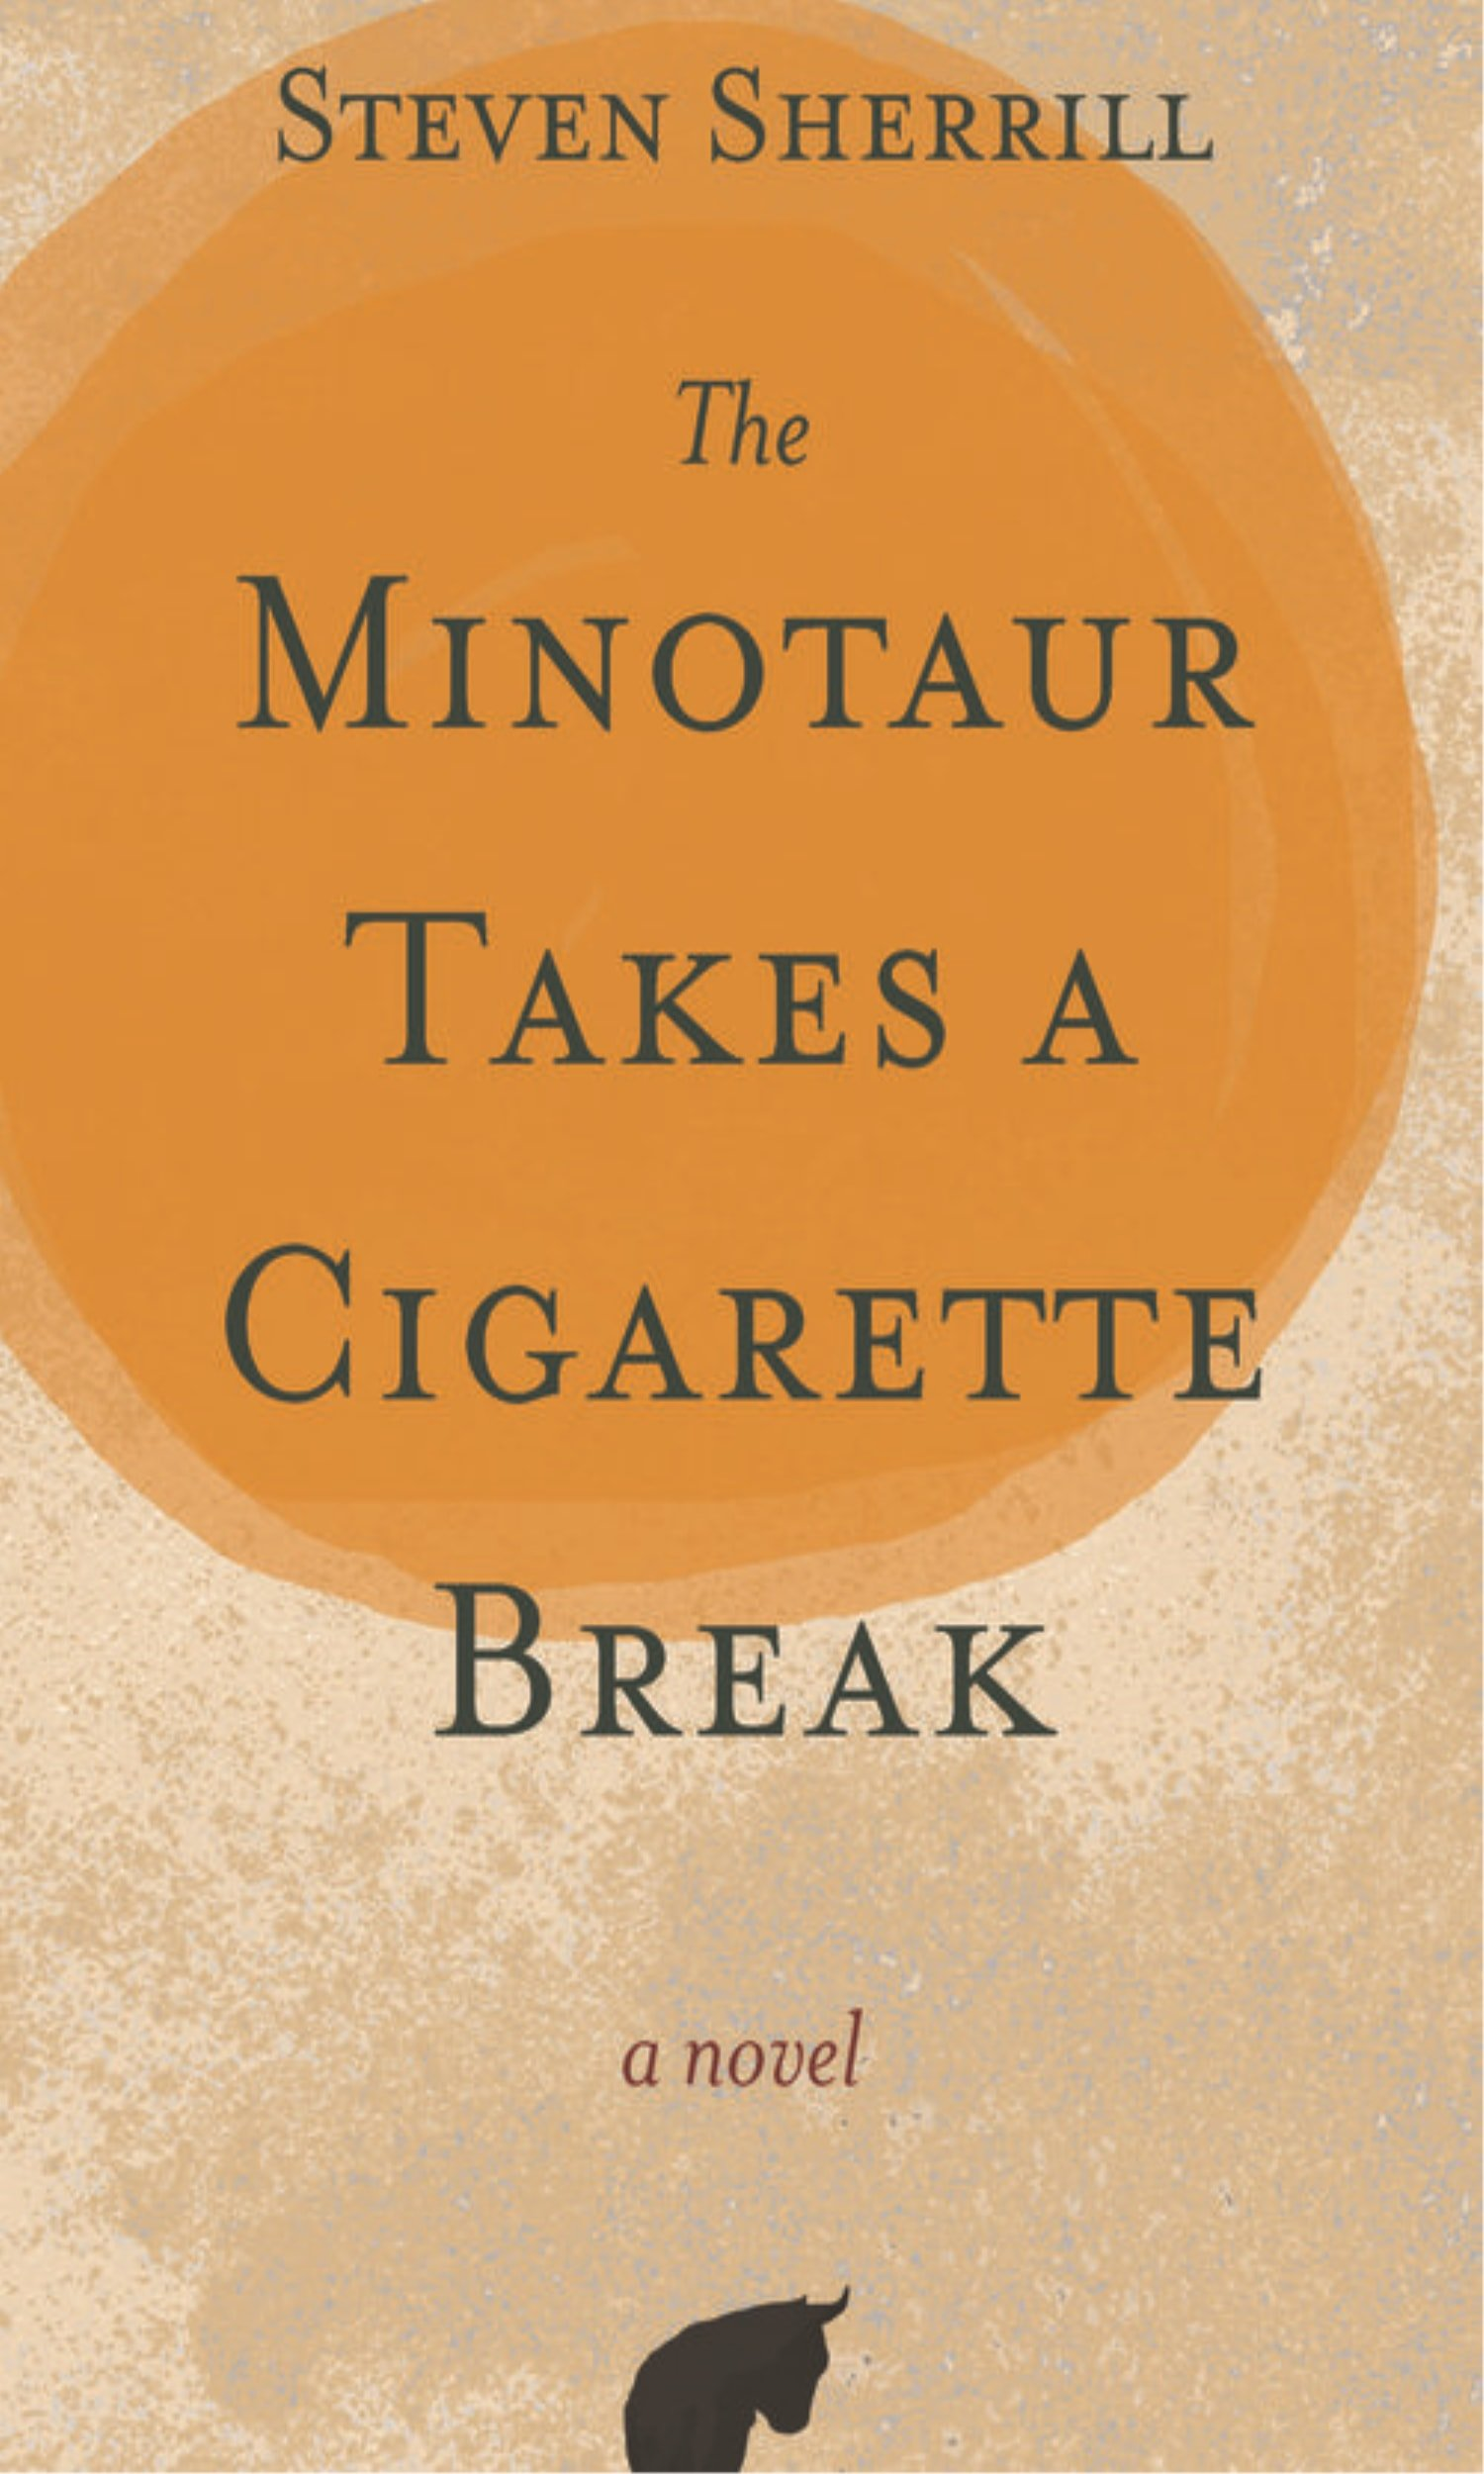 The Minotaur Takes a Cigarette Break pdf